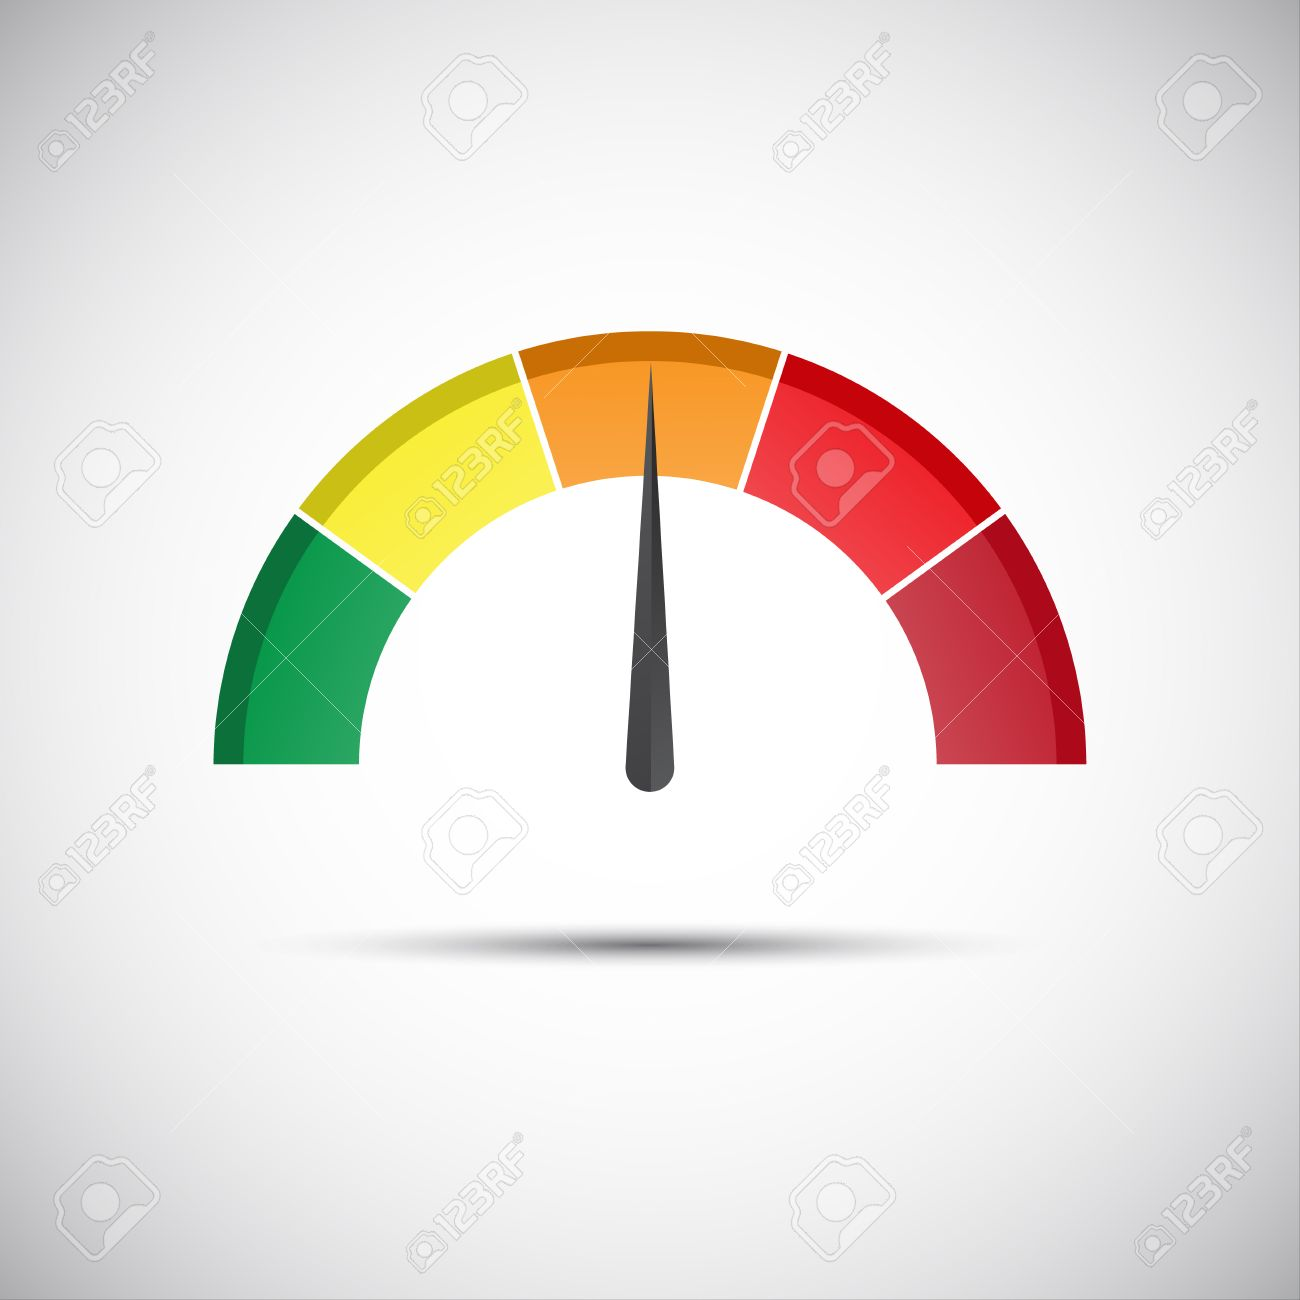 Color Tachometer, Flow Meter With Indicator In Orange Part, Speed ...